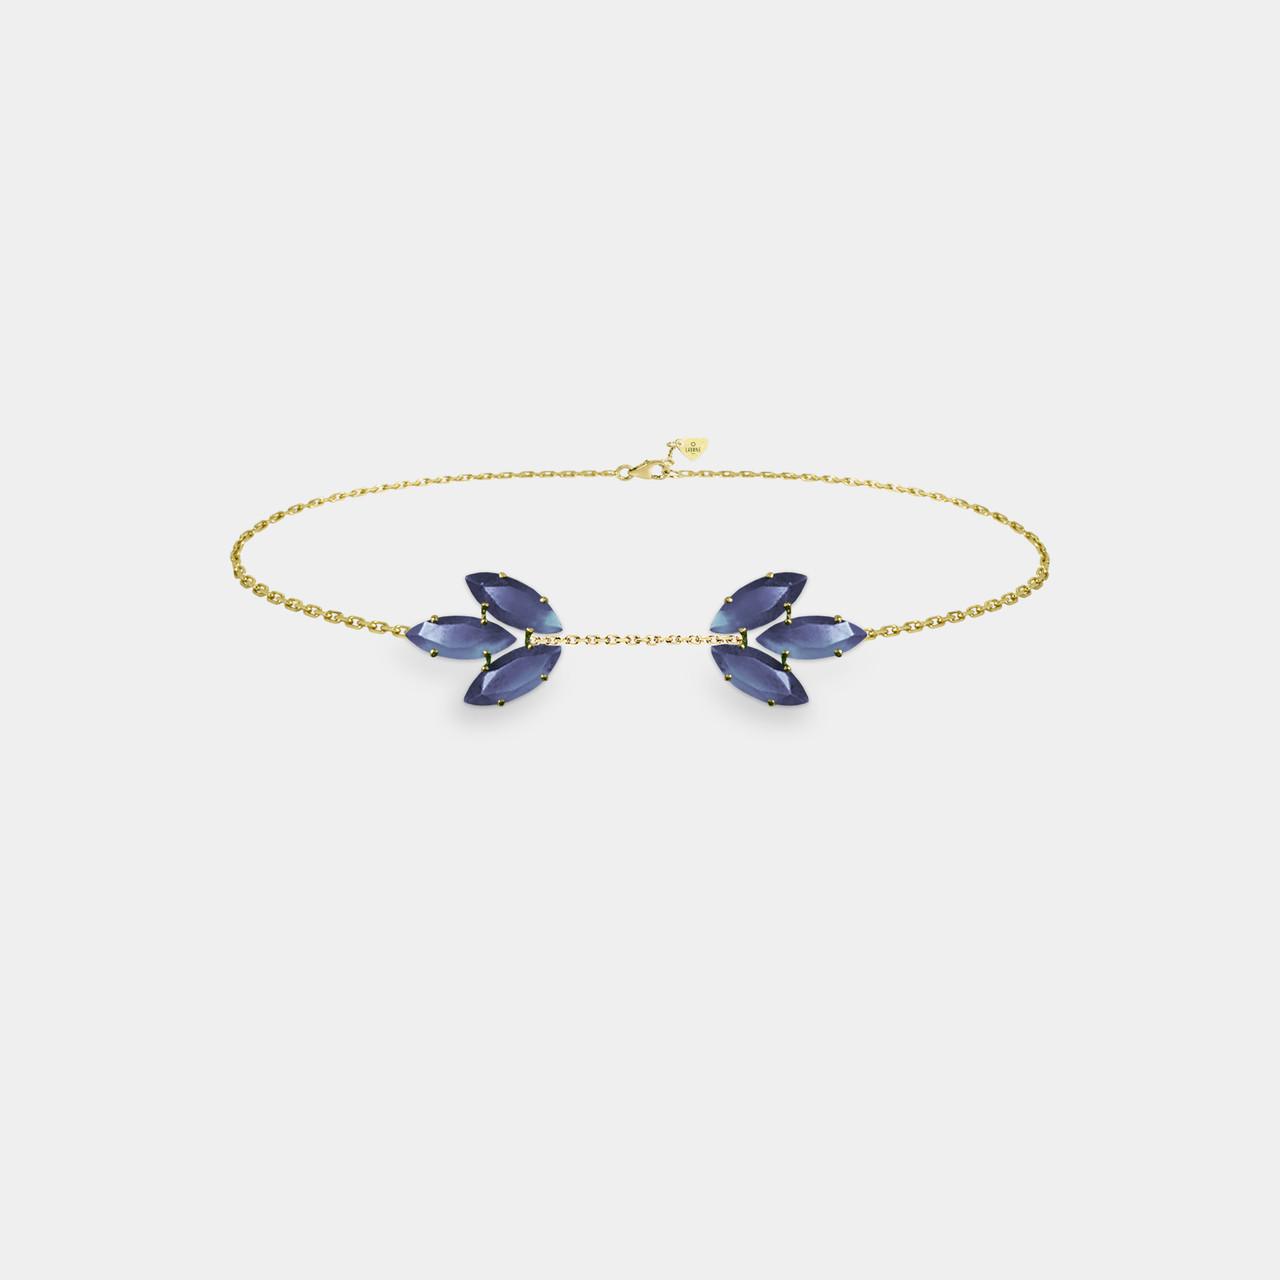 Bracelet Navette Iolite, Bracelet Femme Iolite